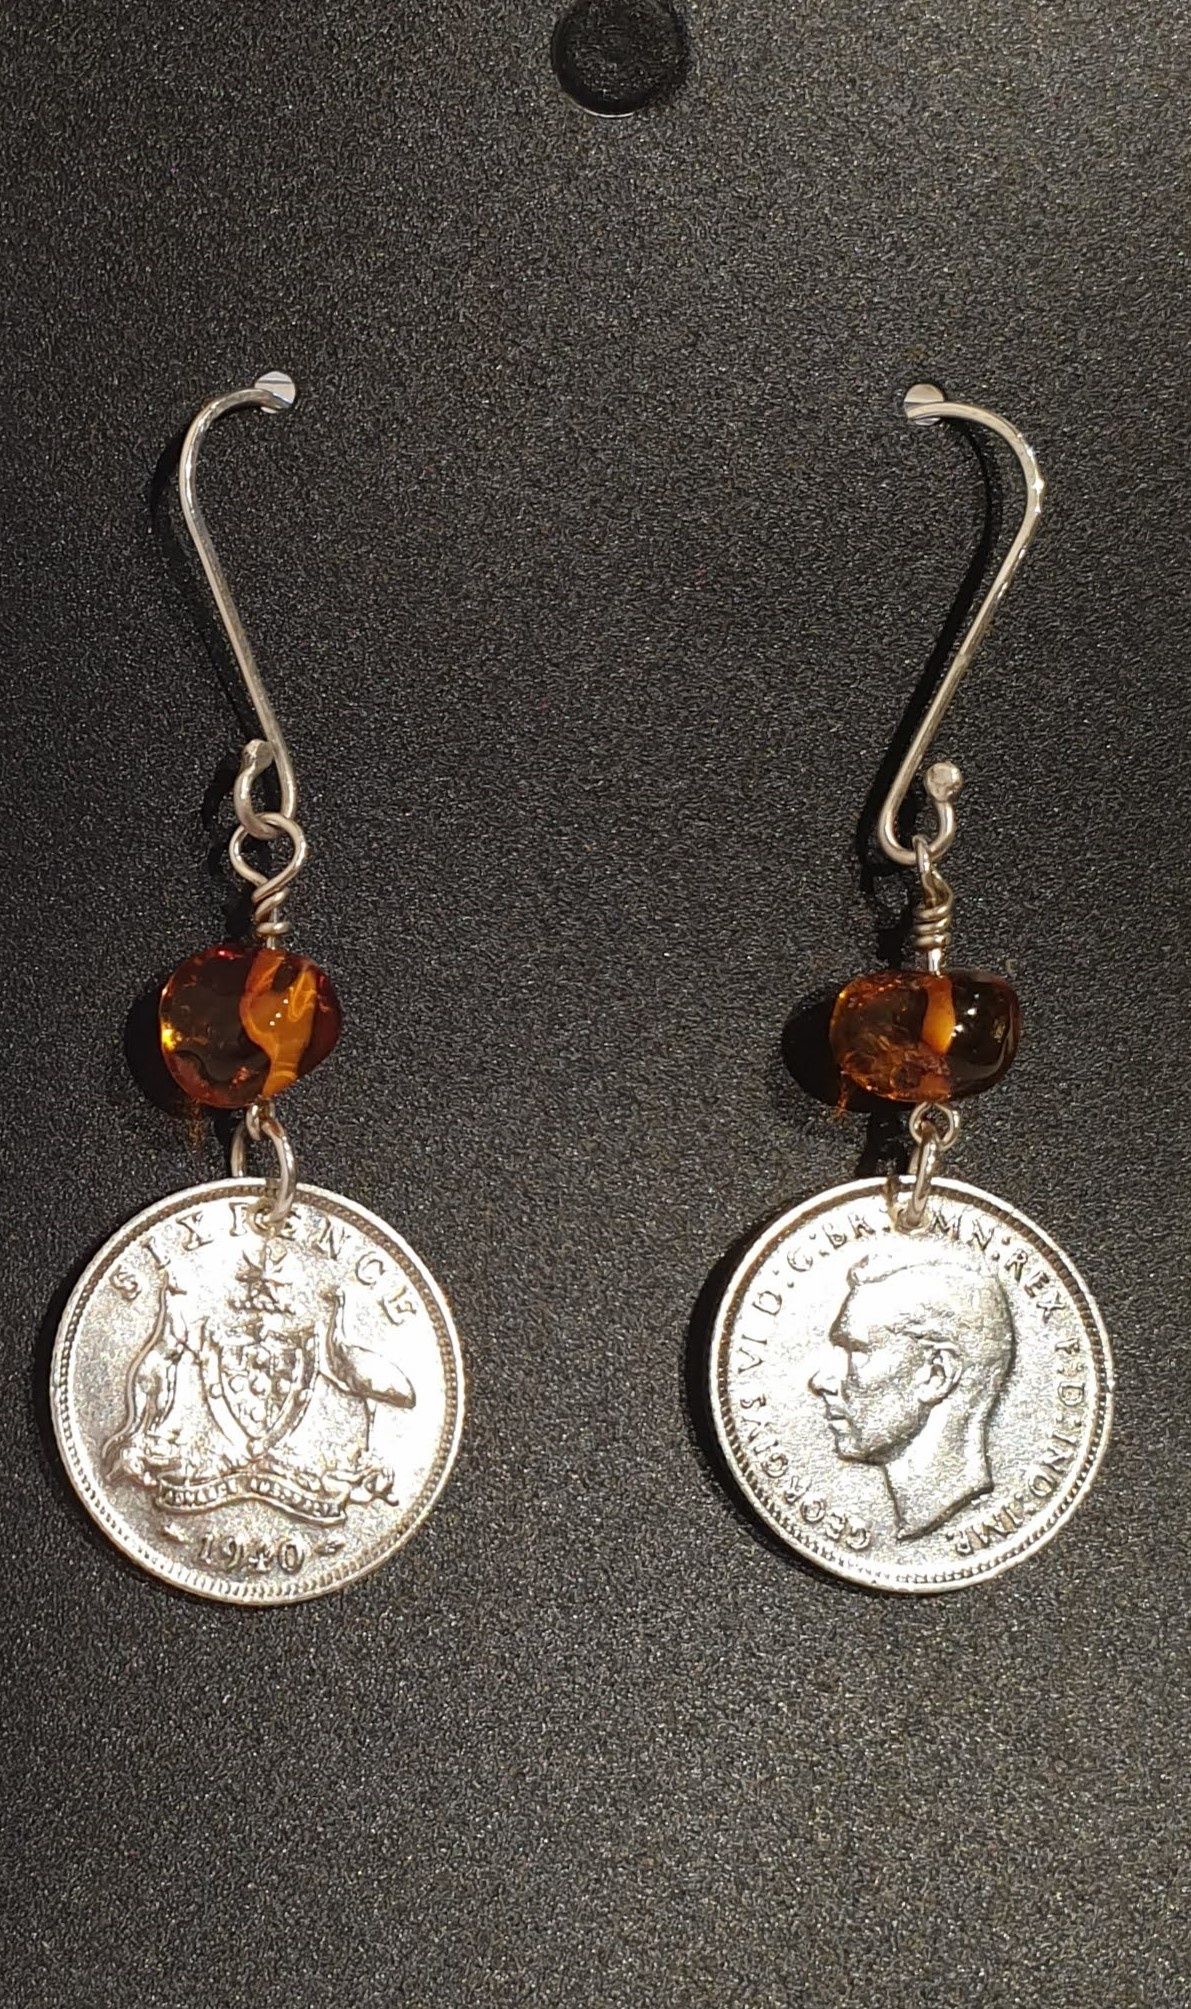 Genuine 1940 Sixpence and Amber Earrings